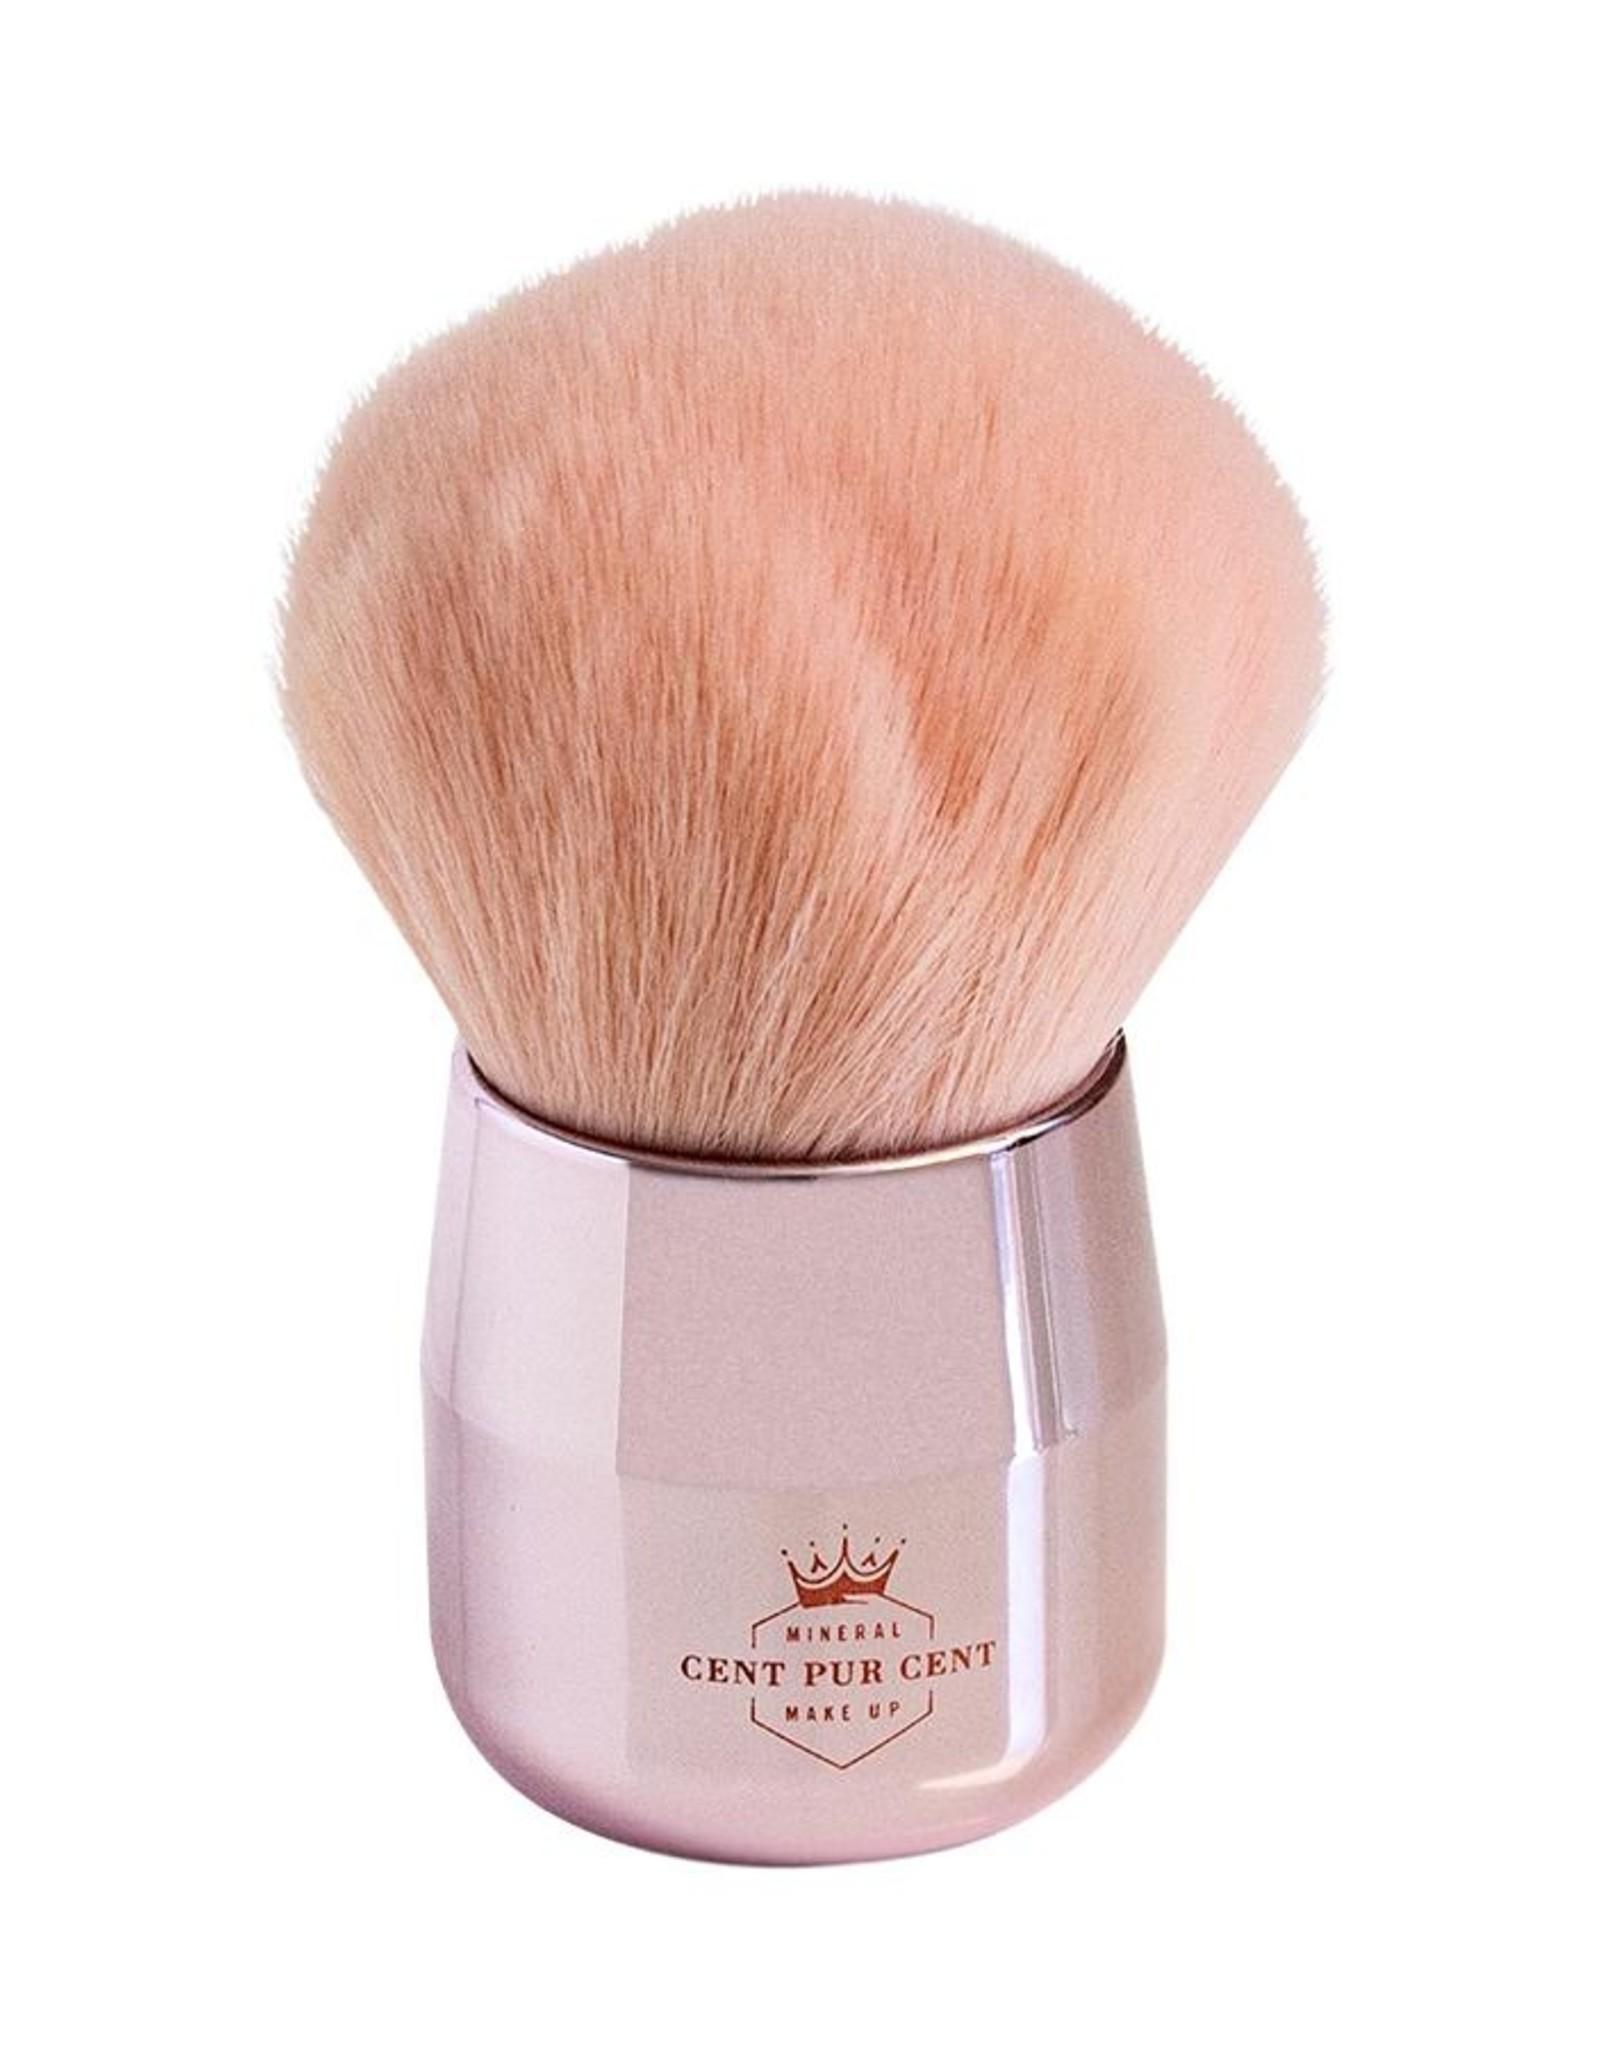 CentpurCent Luxe Kabuki Rose Limited Edition - CentPurCent